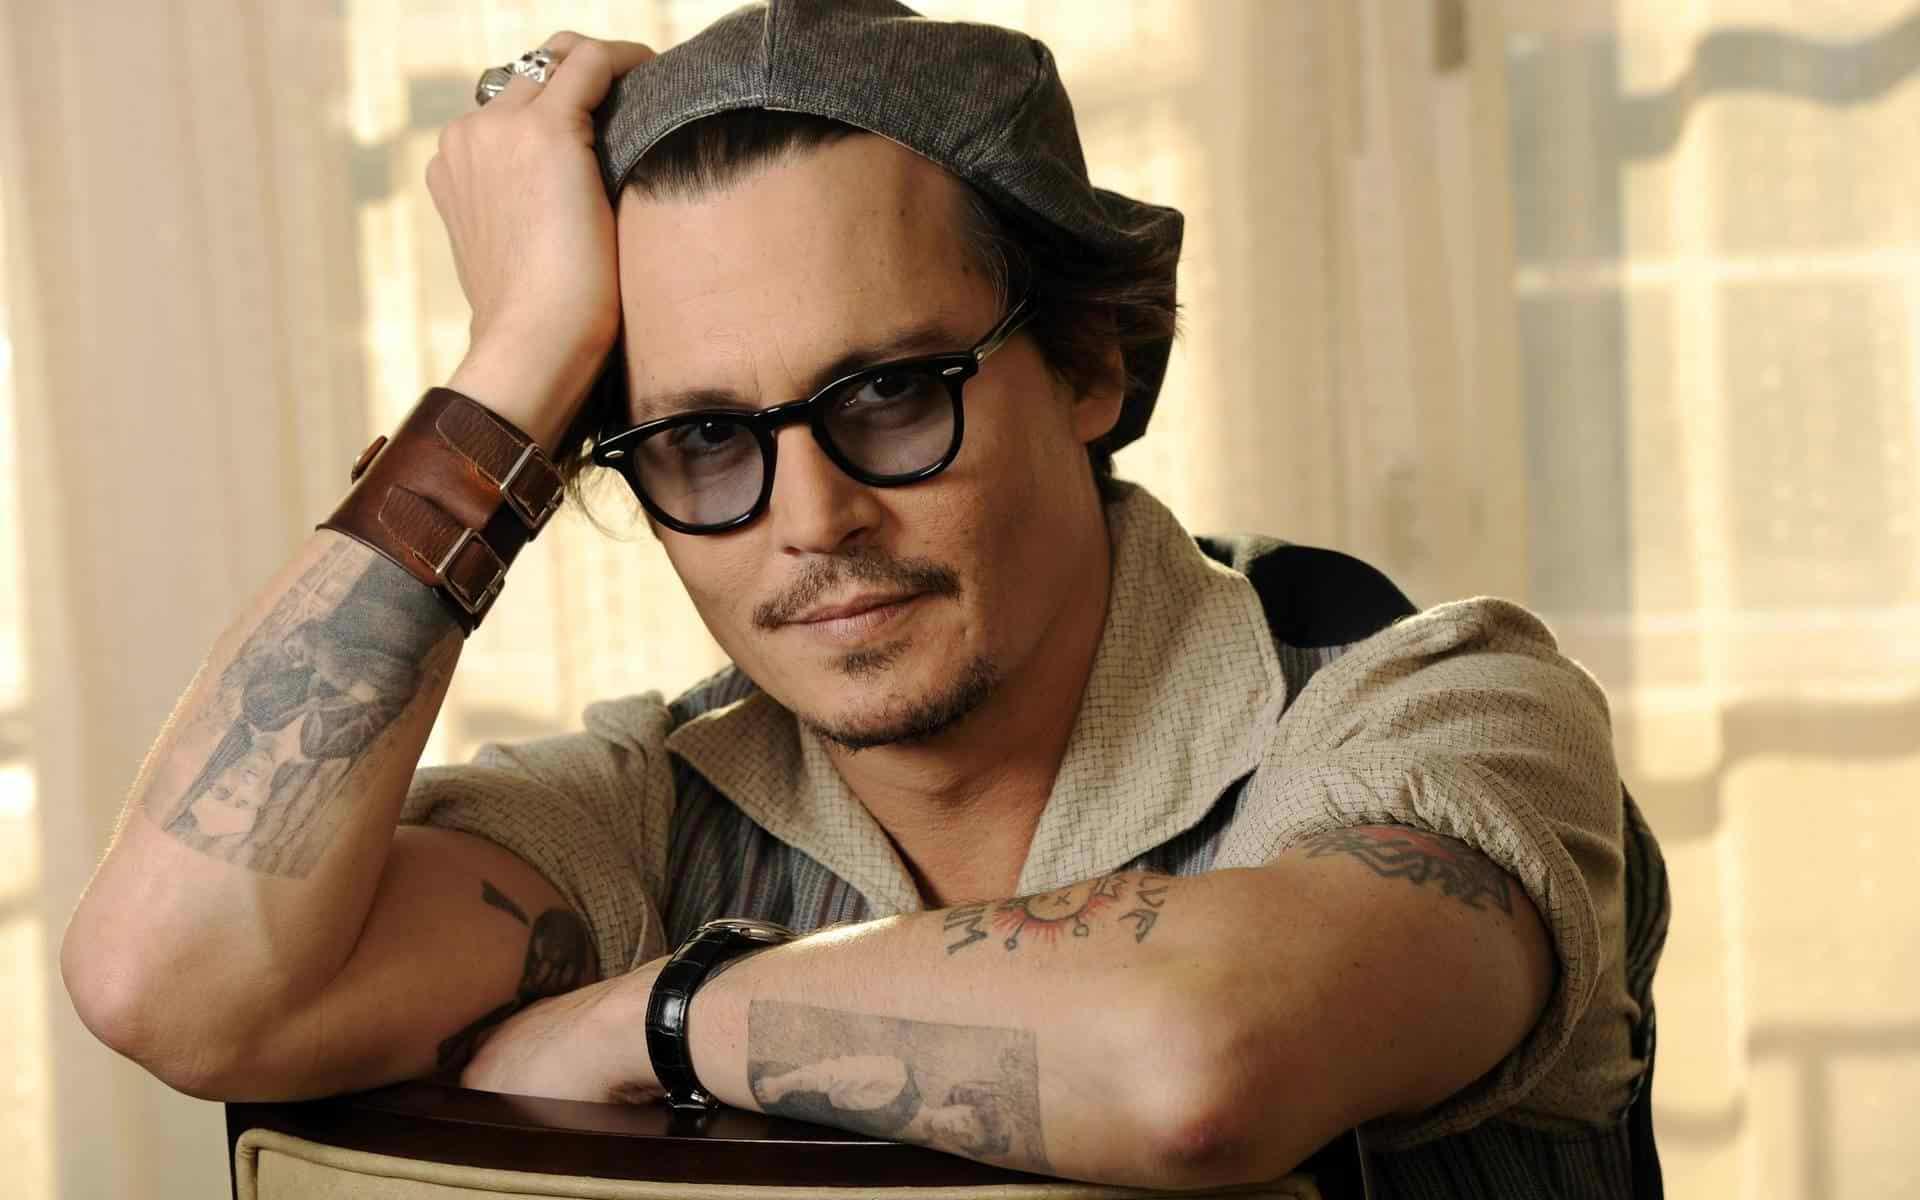 johnny_depp_takes_actor_man_tattoo_19007_1920x1200